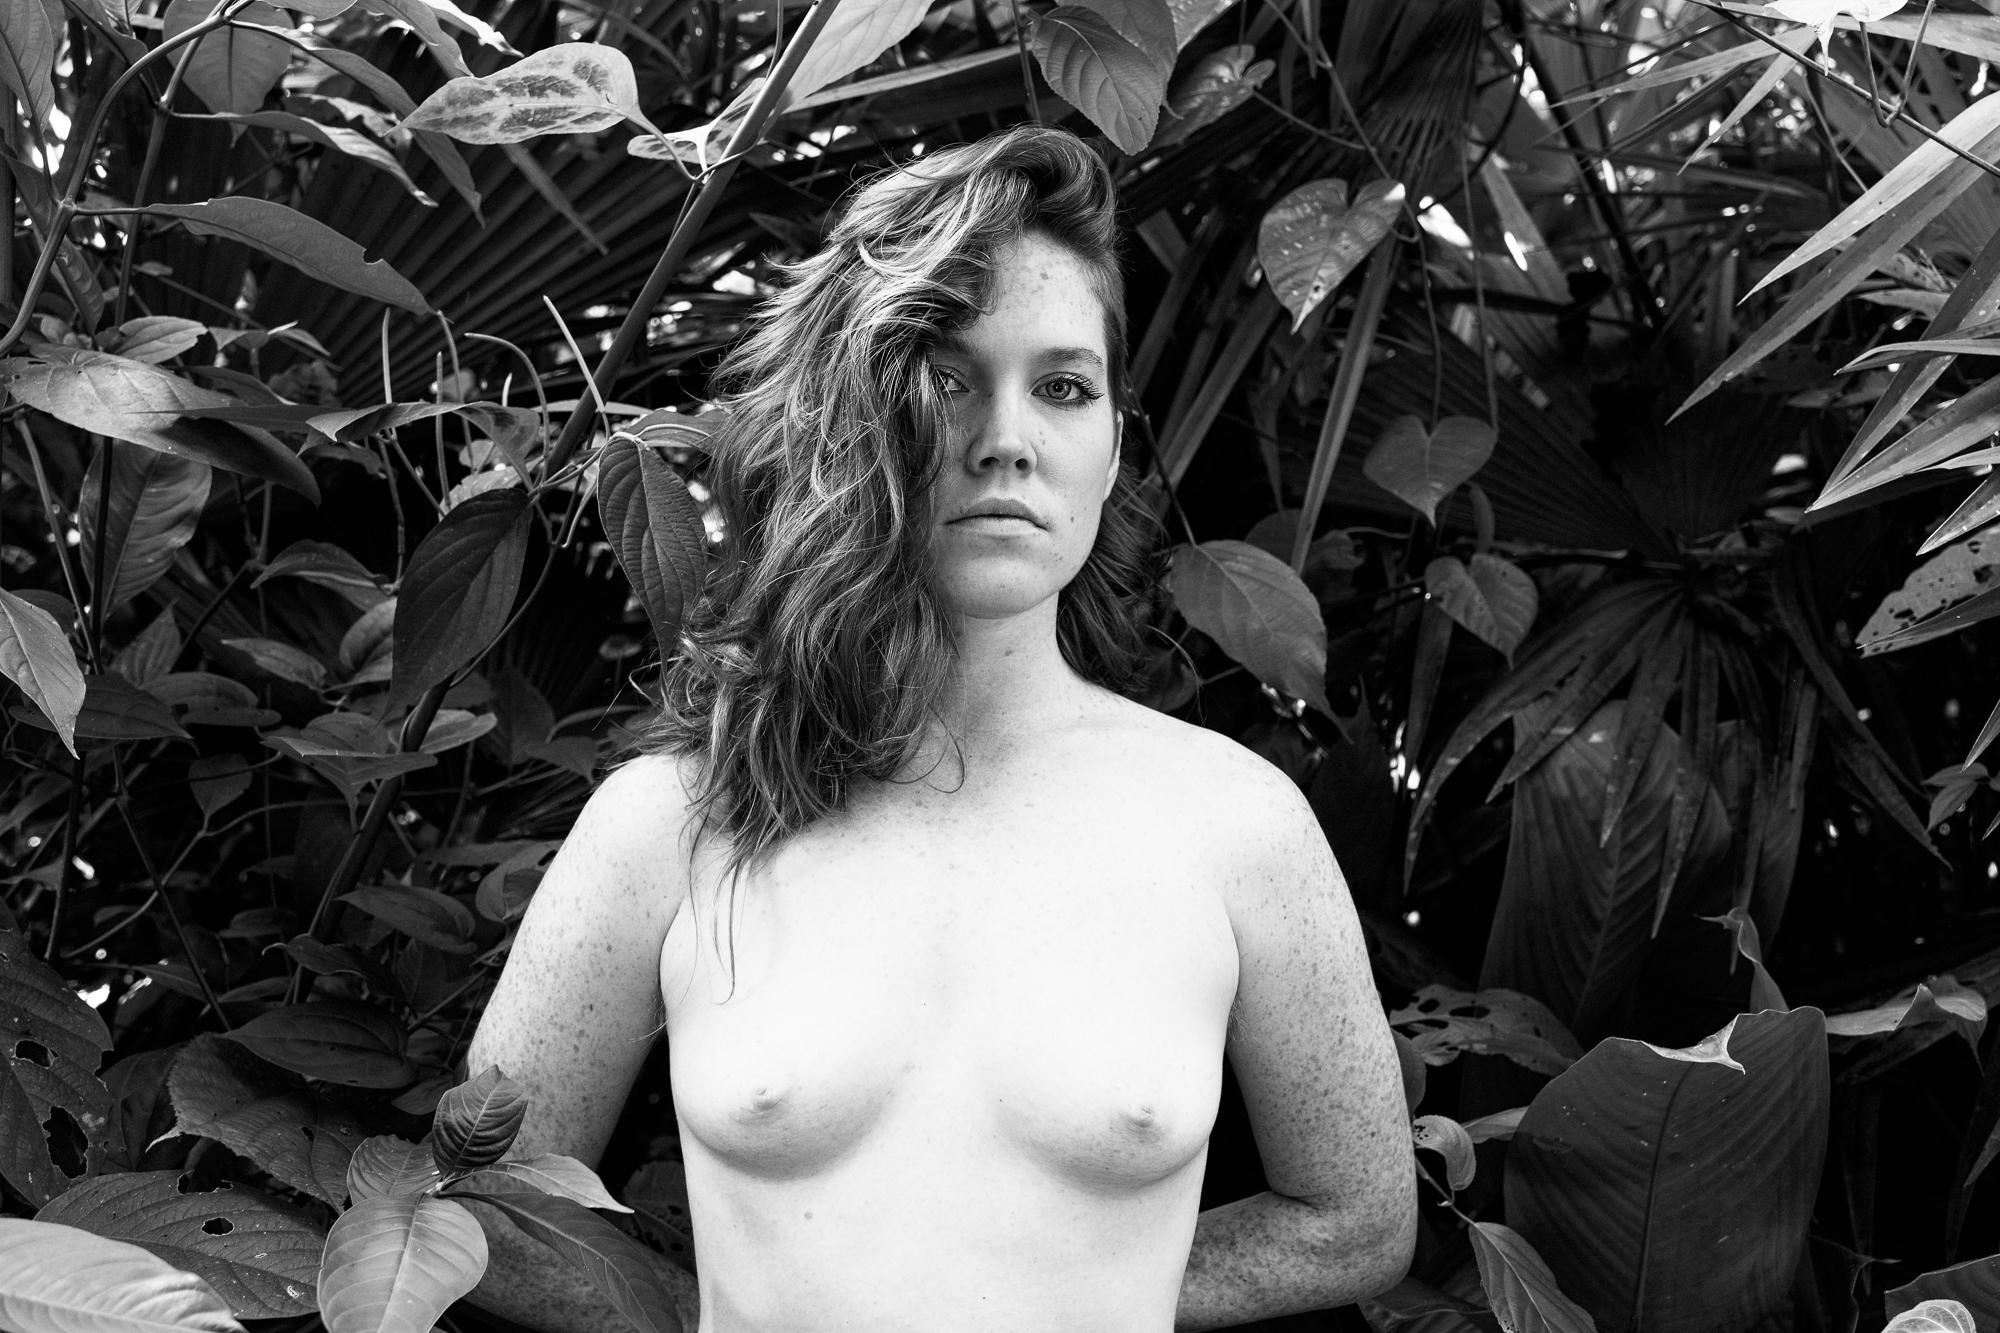 20170210-Ariane-Cassidy-Hannah-Amazon-jungle-FUJIFILM-X-Pro2-0053.jpg